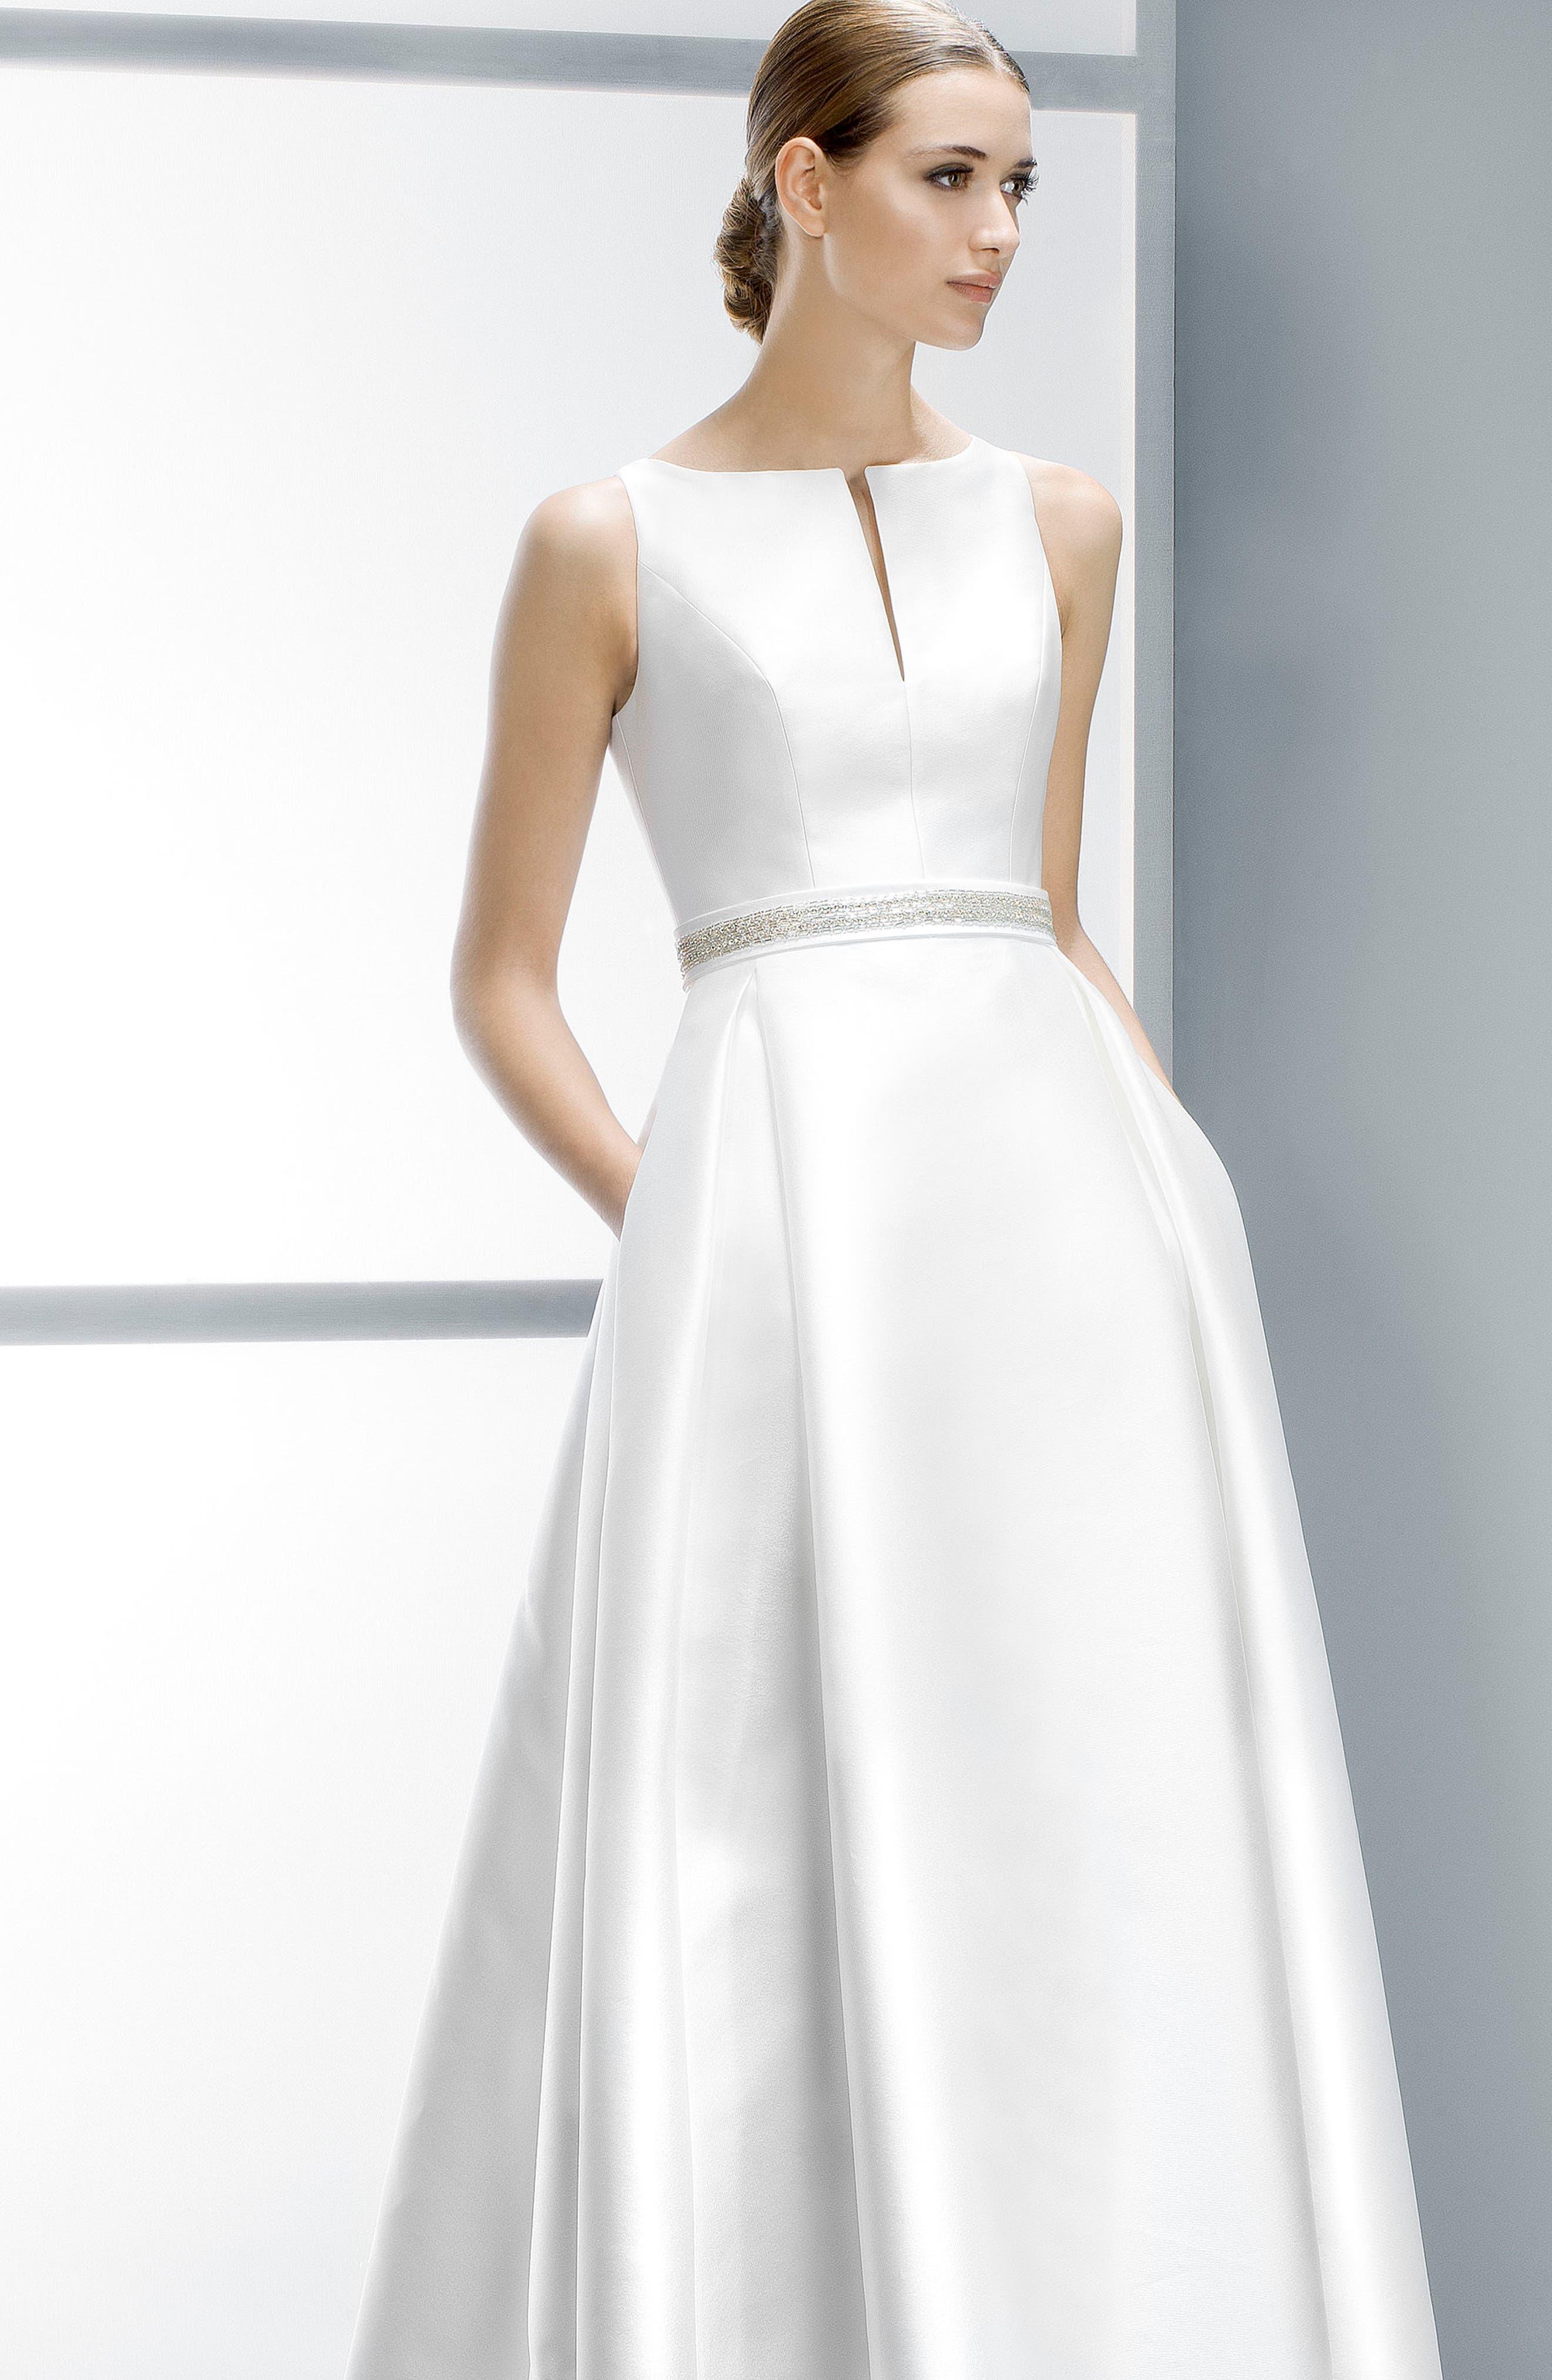 Embellished Waist Mikado A-Line Dress,                             Alternate thumbnail 8, color,                             IVORY